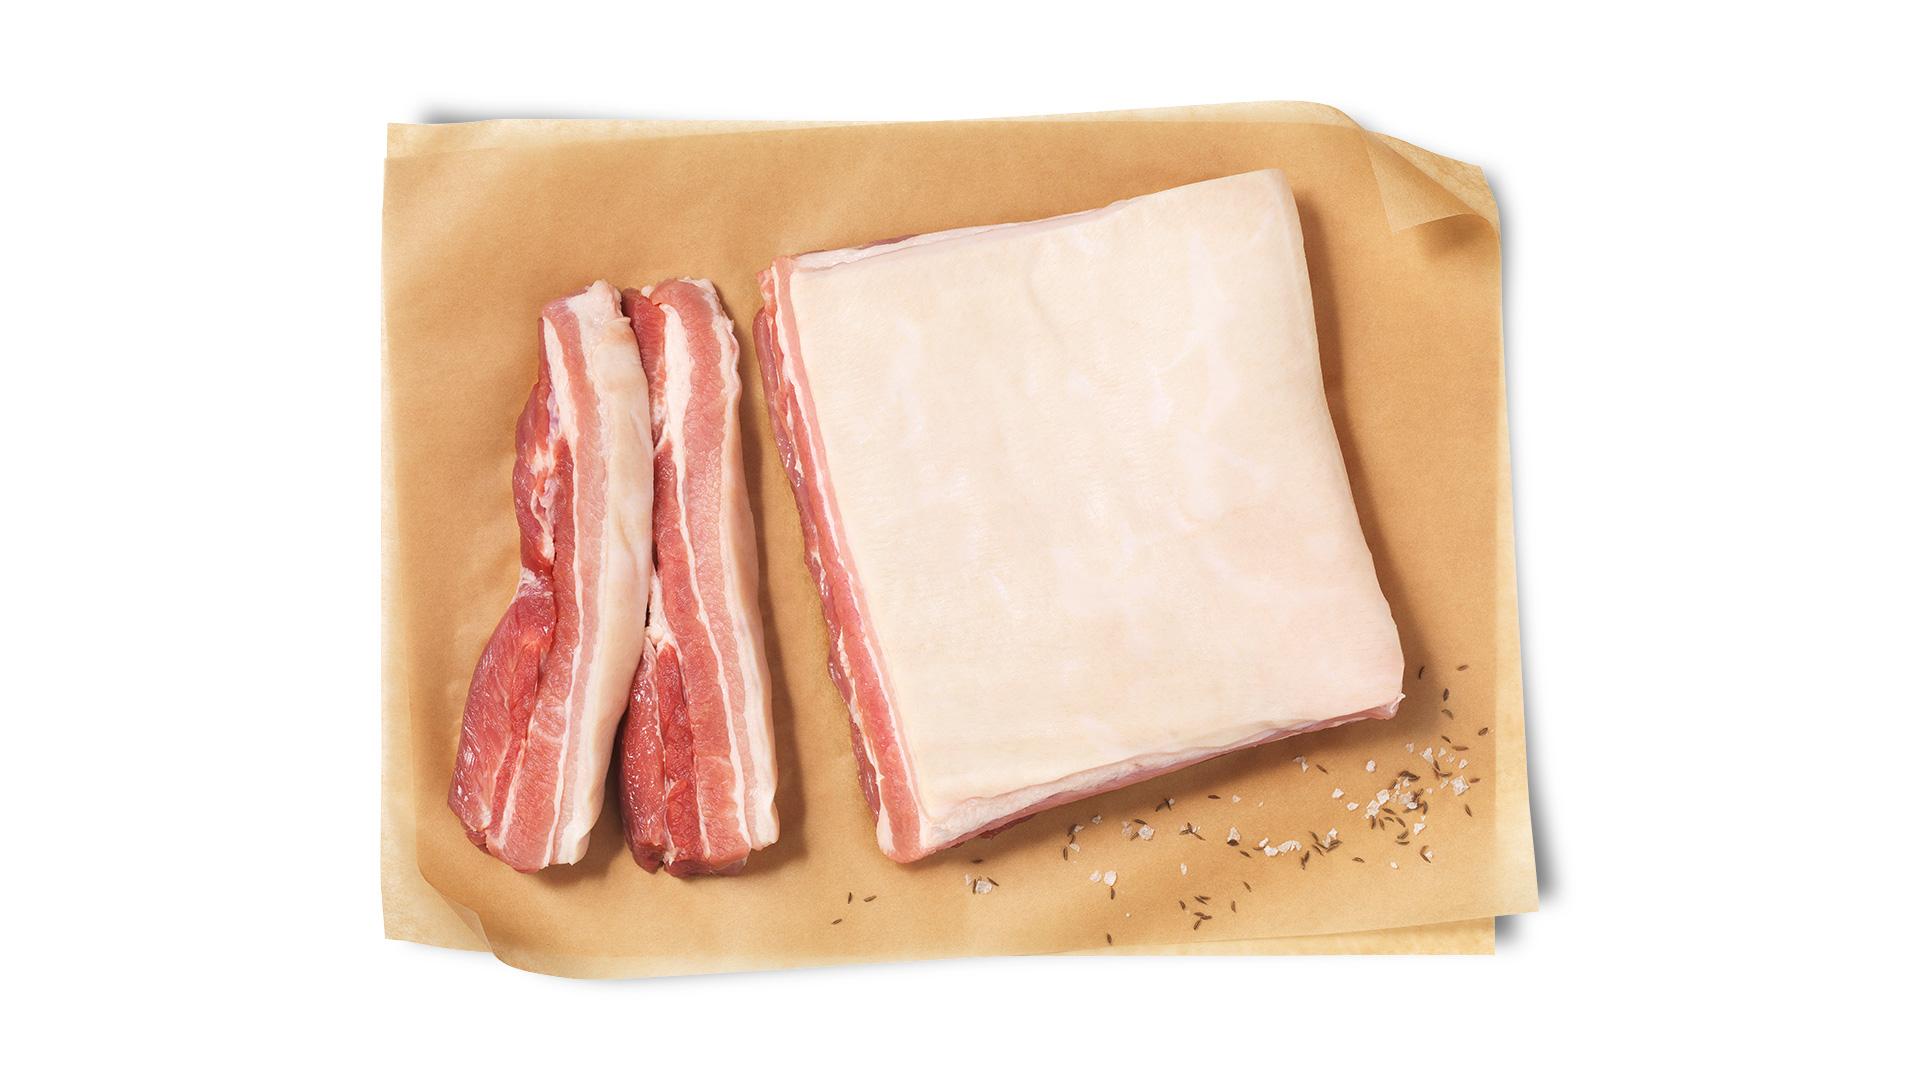 Hofstädter Bauchfleisch